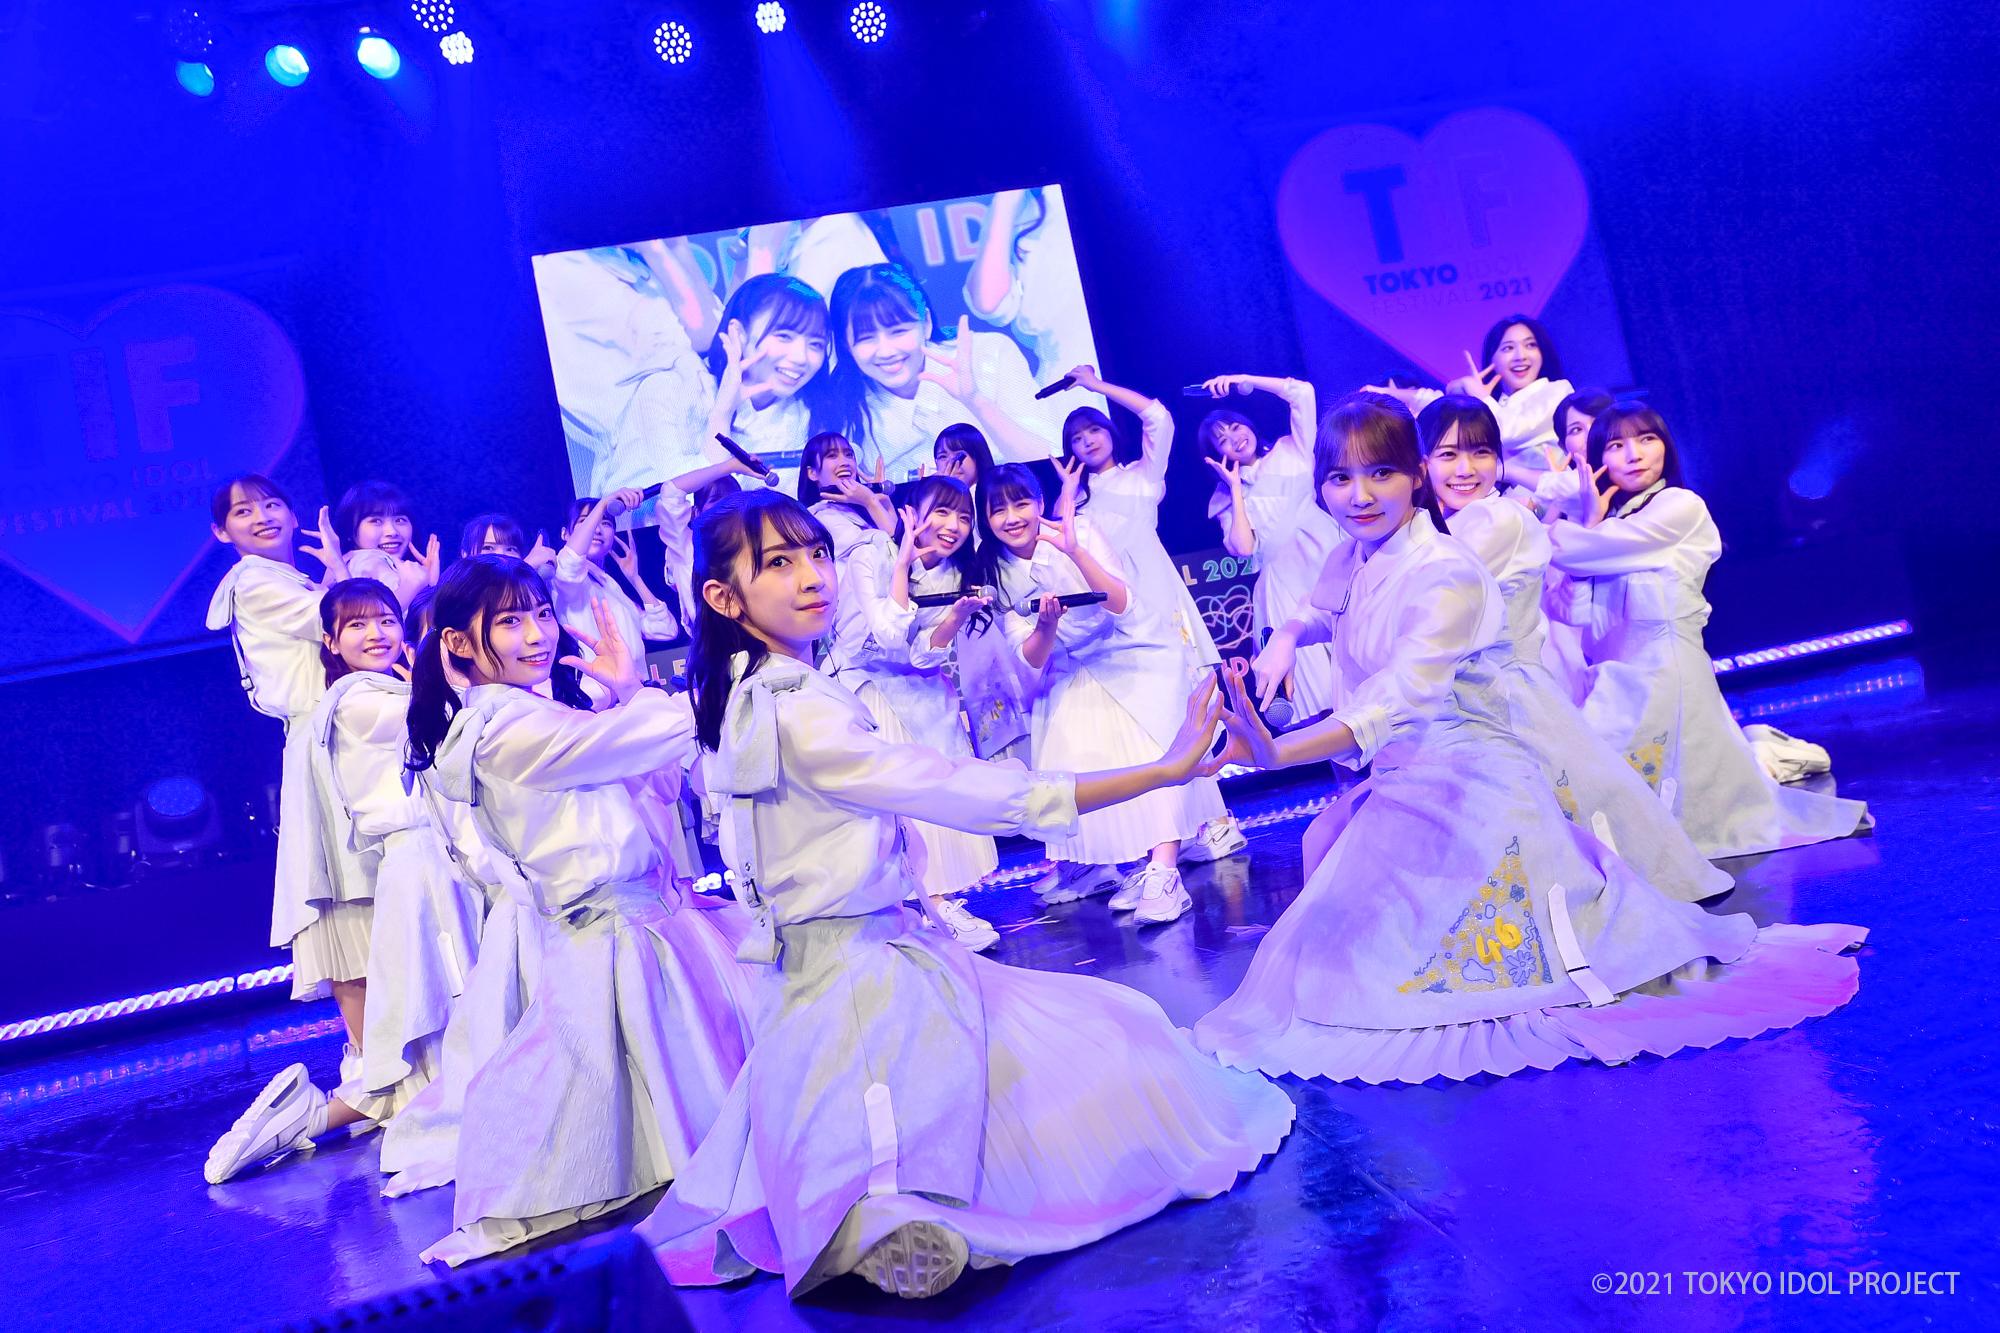 日向坂46 TOKYO IDOL FESTIVAL 2021 ©ACTRESPRESS